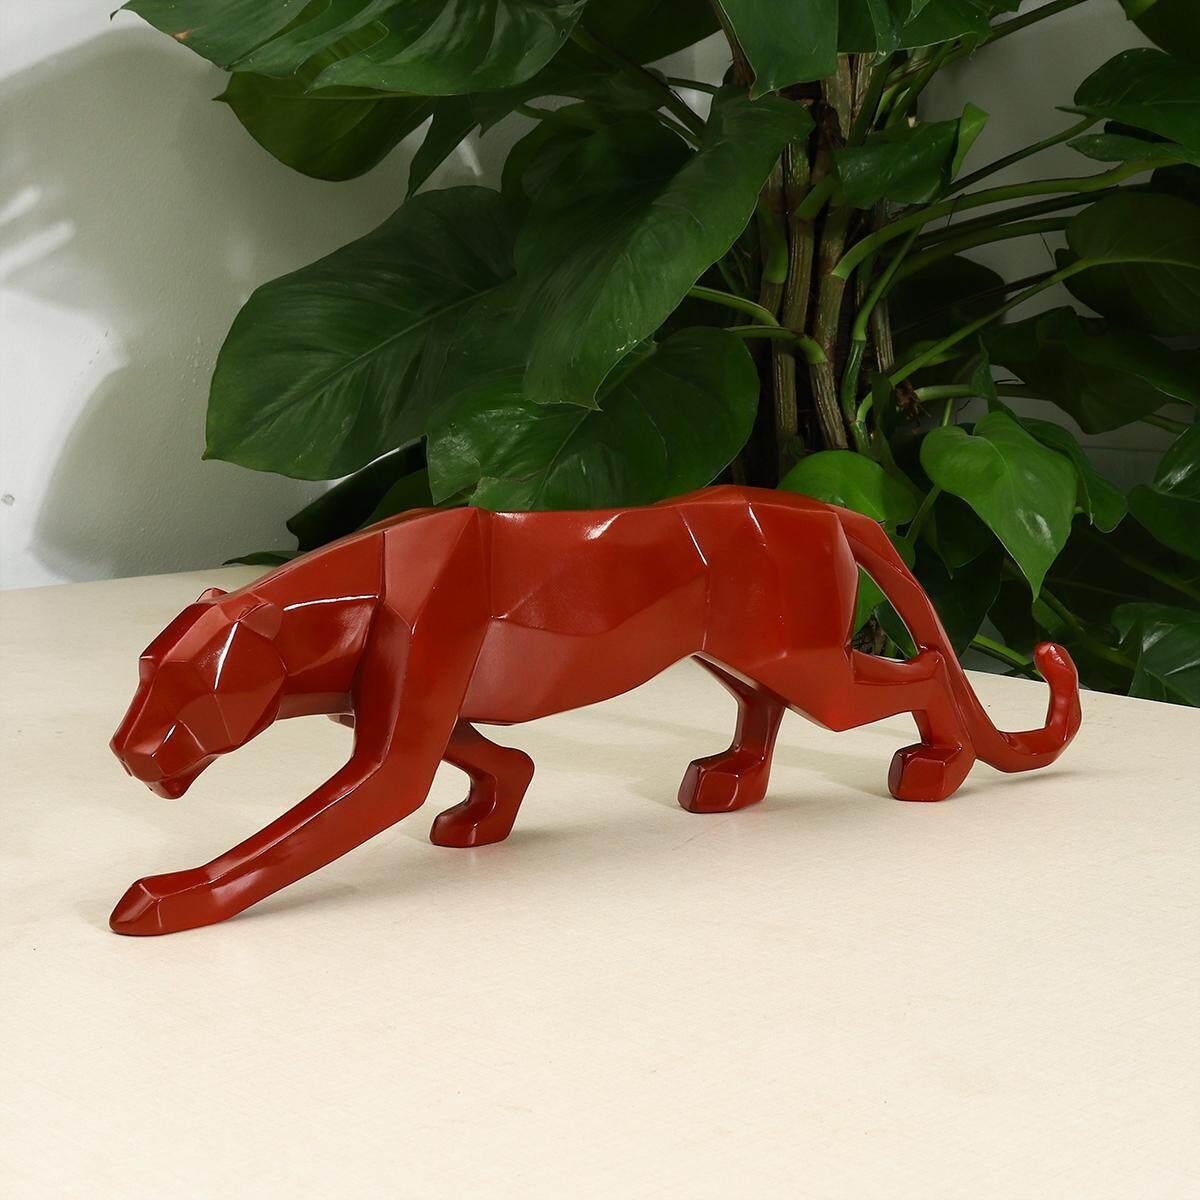 45.5*13.5*4/26*5*8.5 cm Modern Abstract Art Leopard Resin Geometric Resin Model Gift Decoration